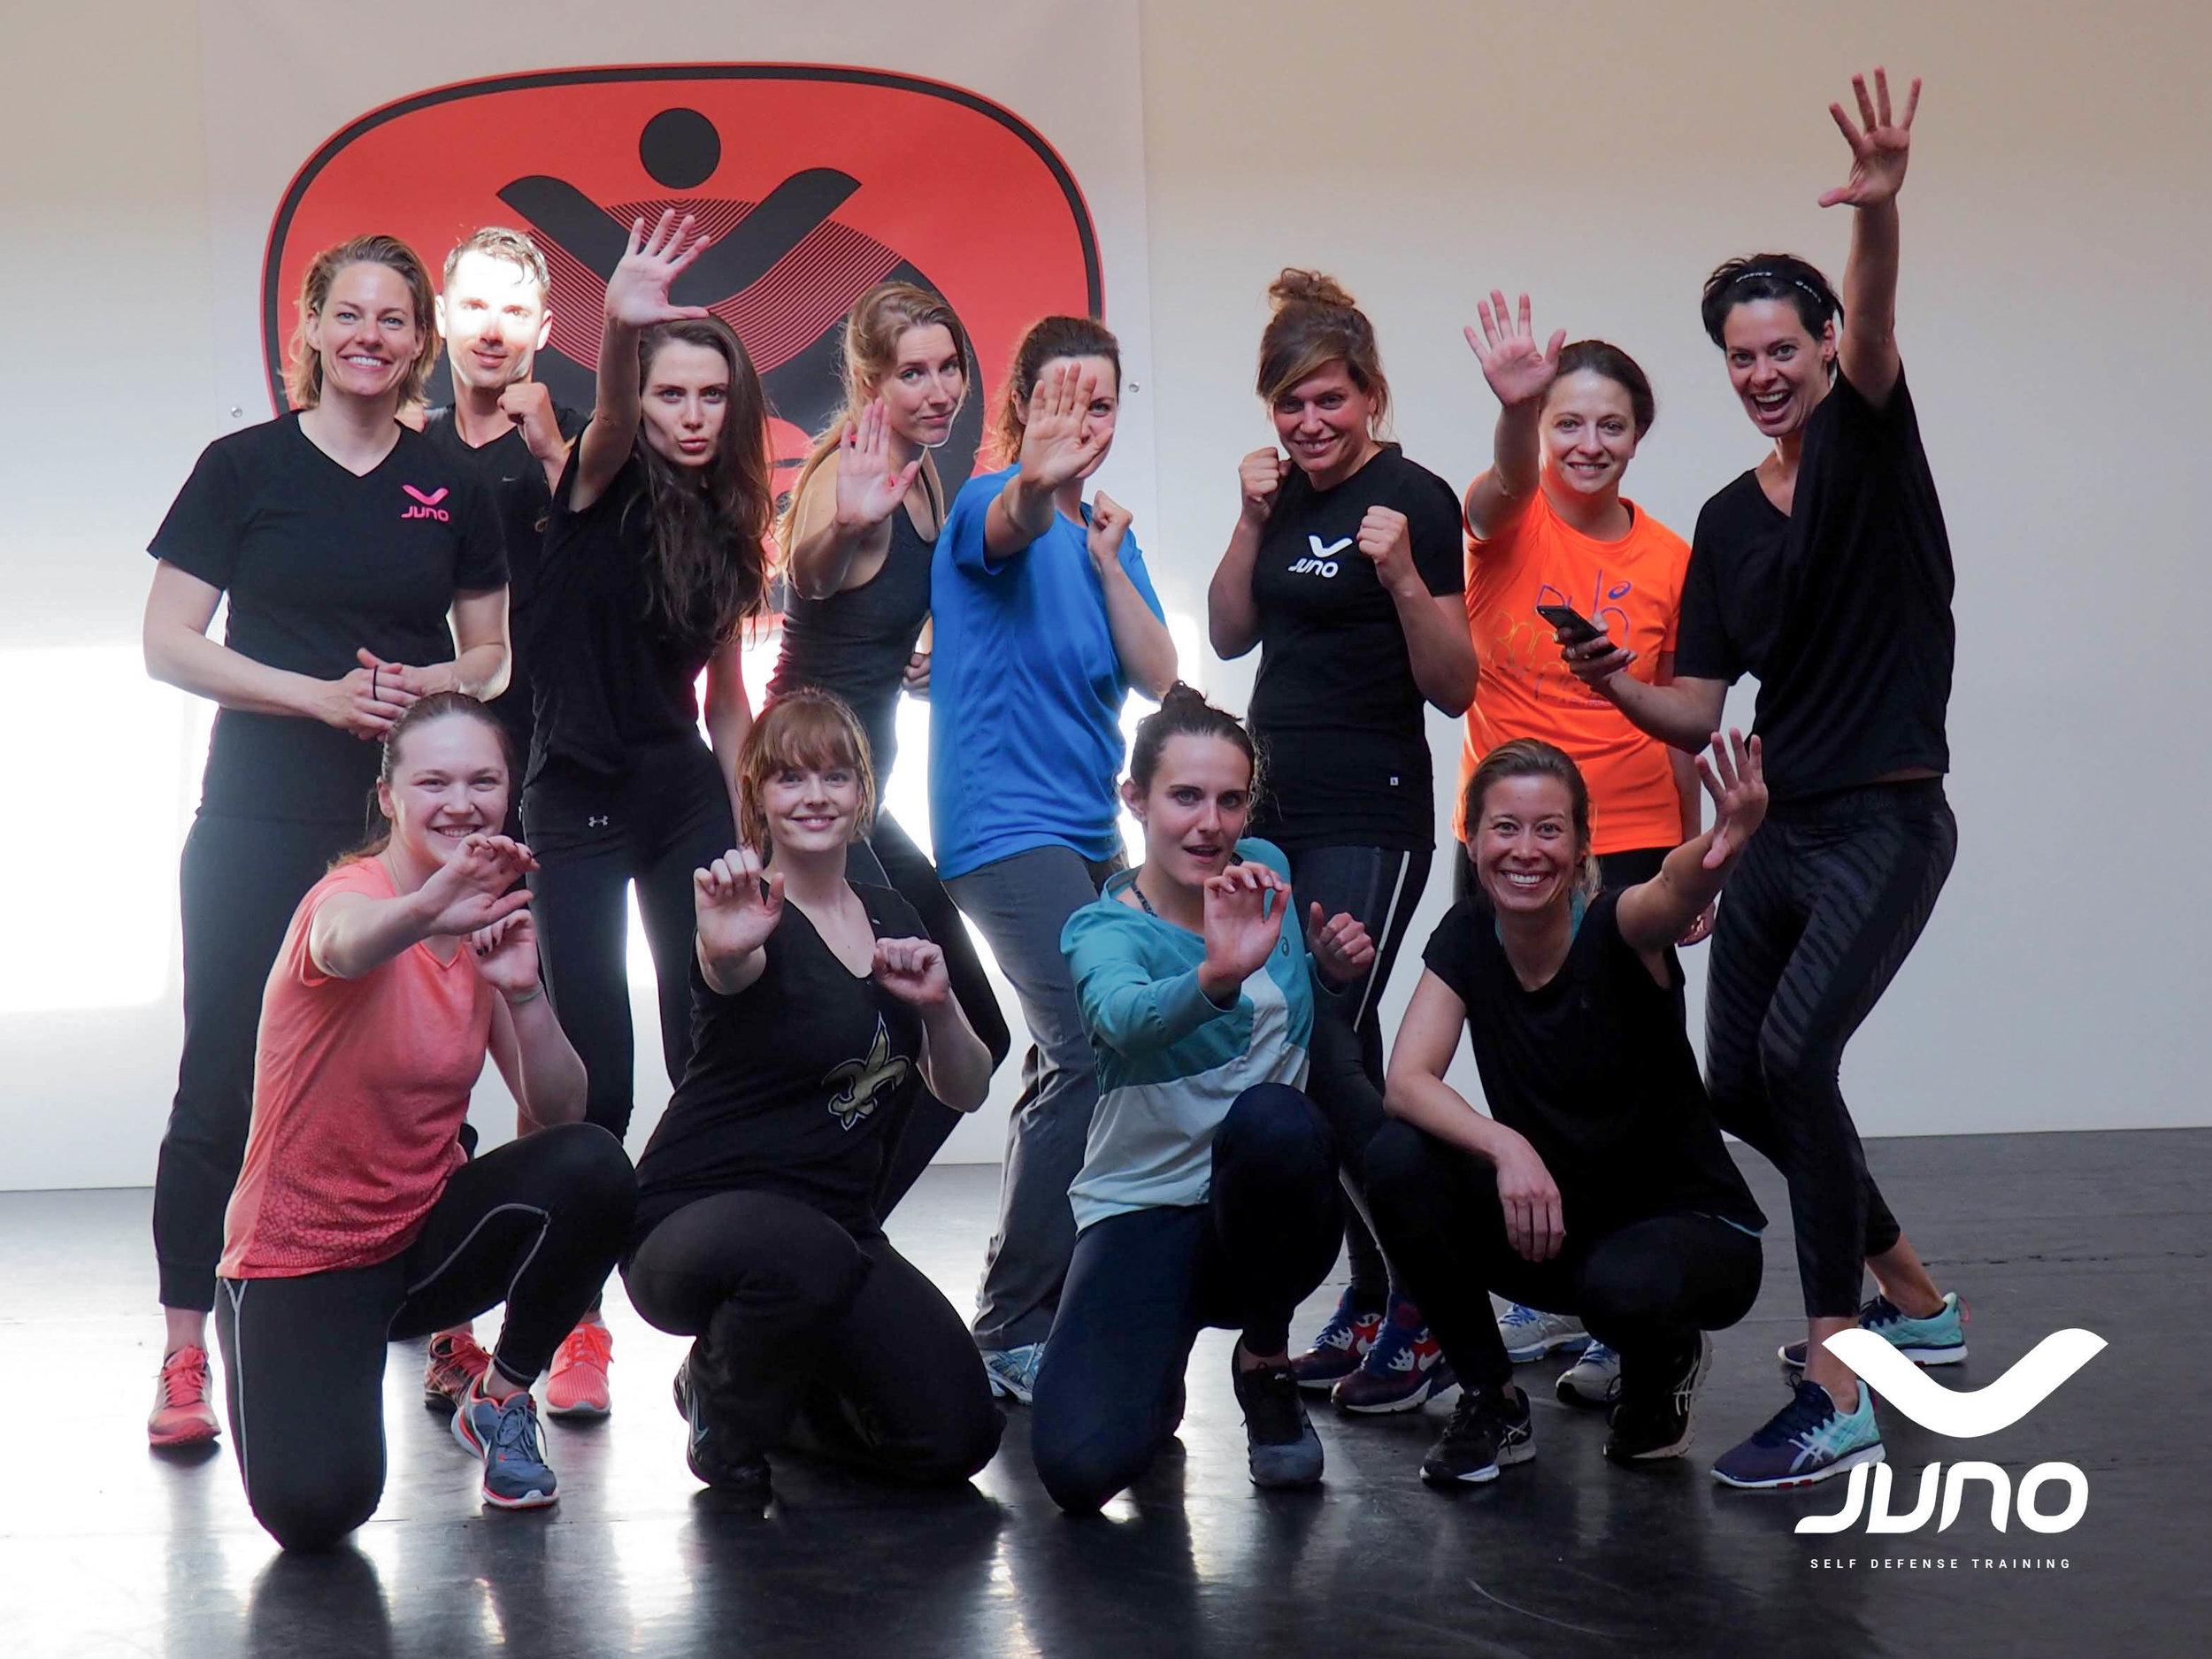 JUNO Kick-Ass Bootcamp